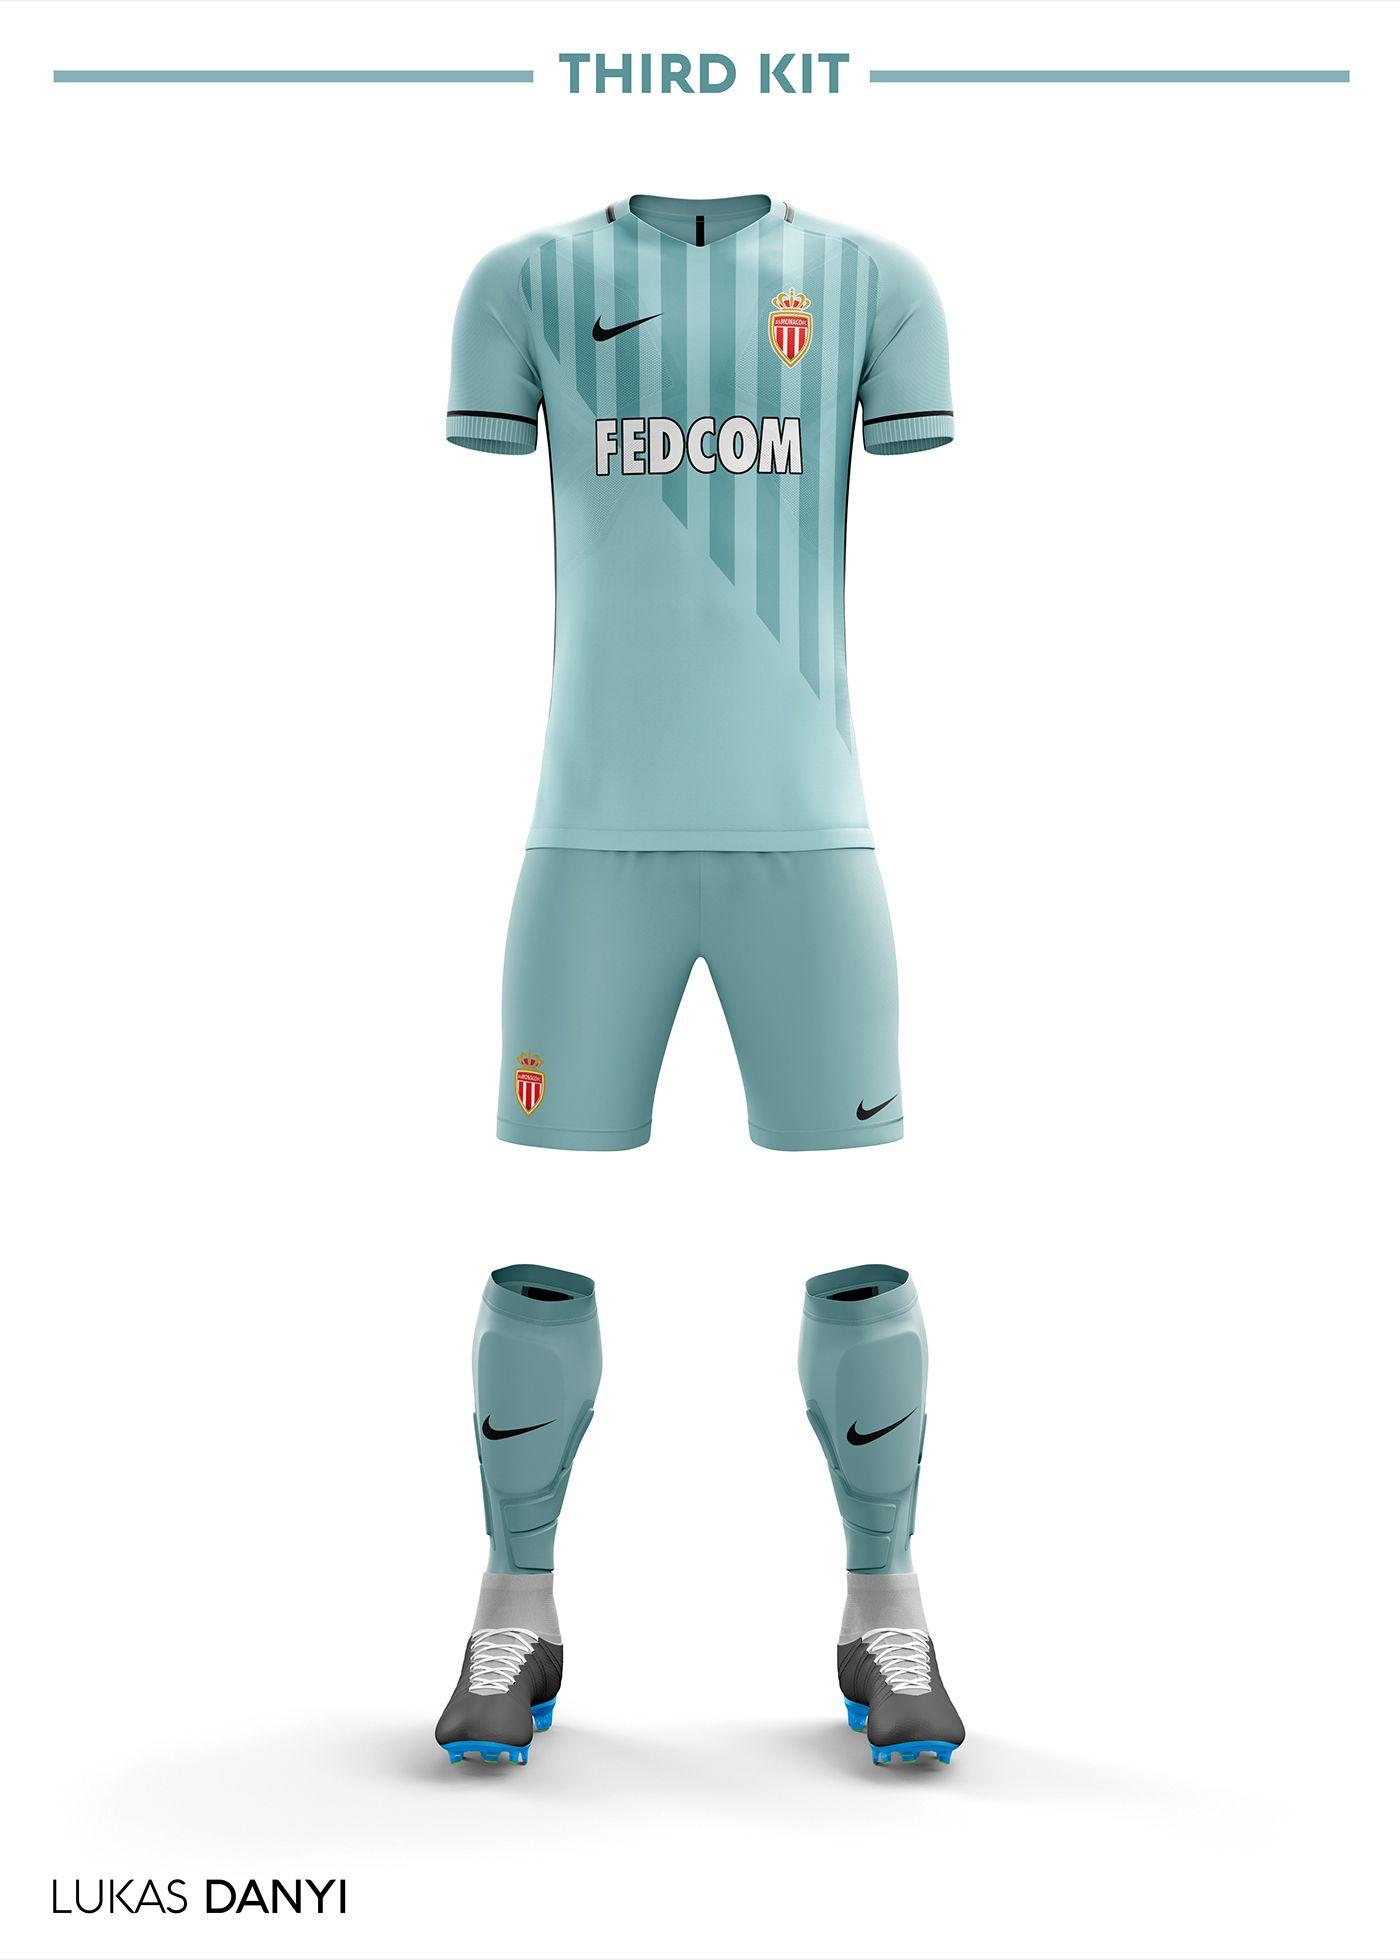 424dfb2960 AS Monaco Football Kit 17 18. on Behance